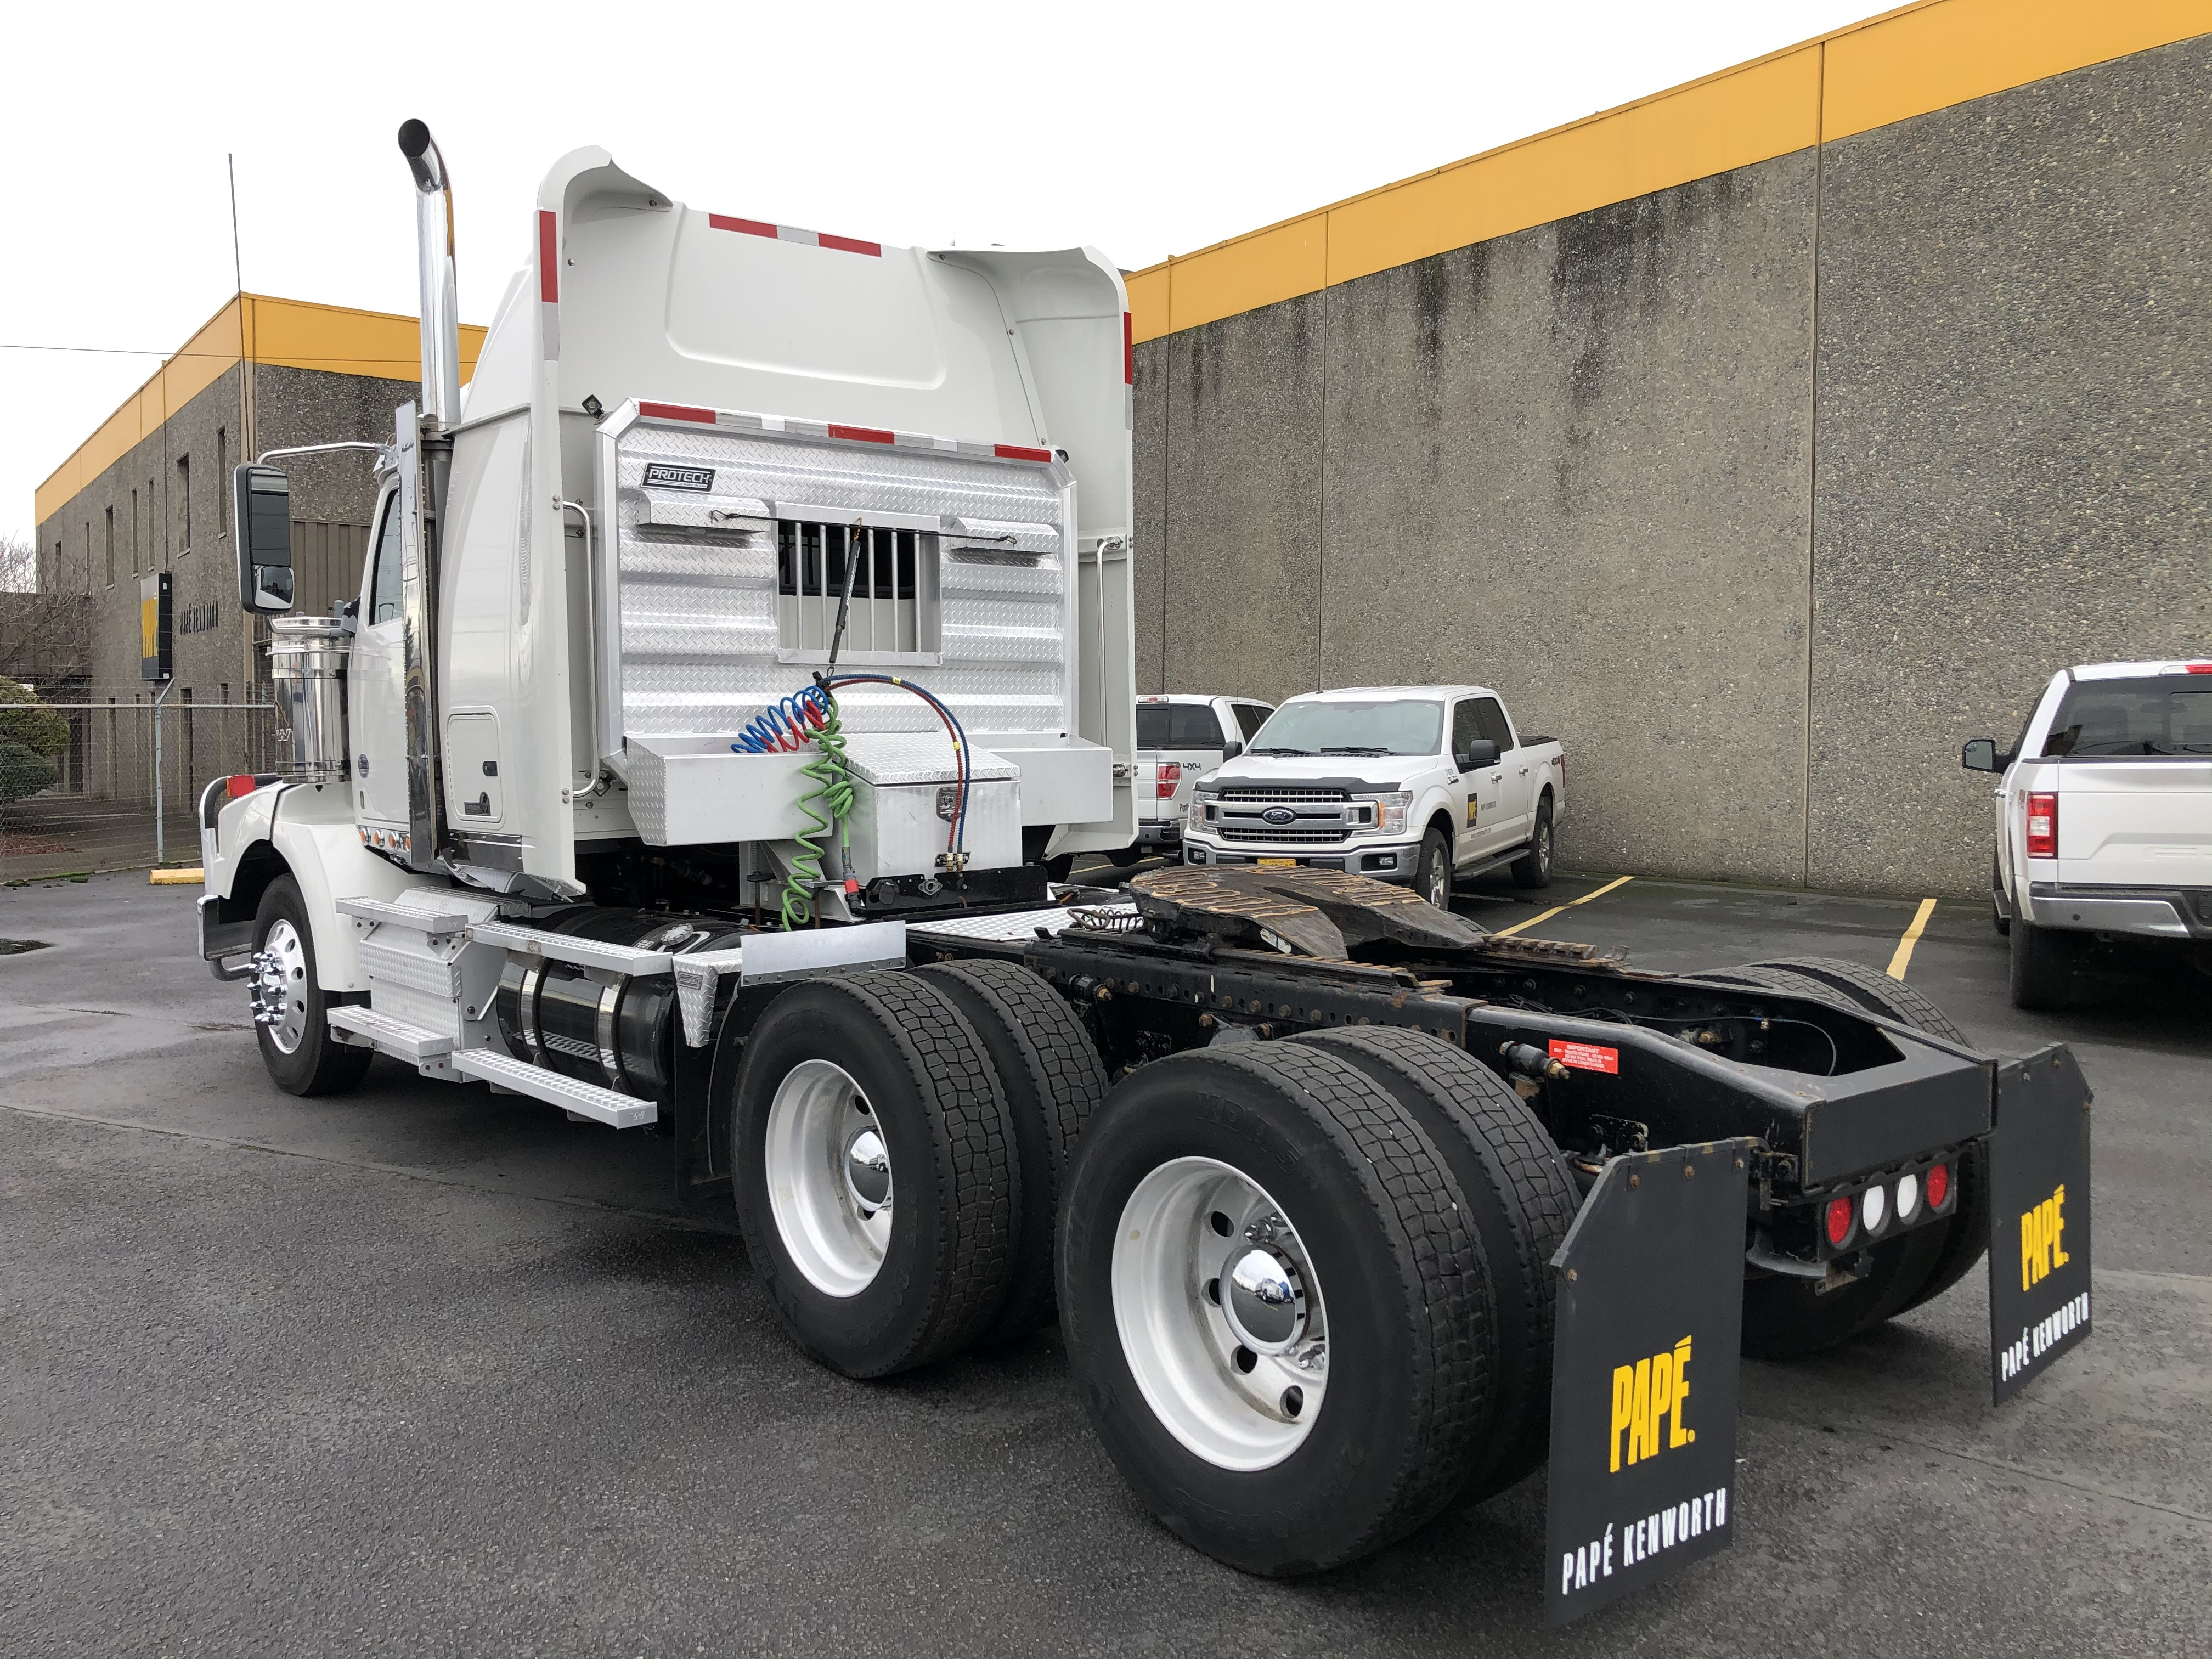 2016 Warner-swasey 4900SB